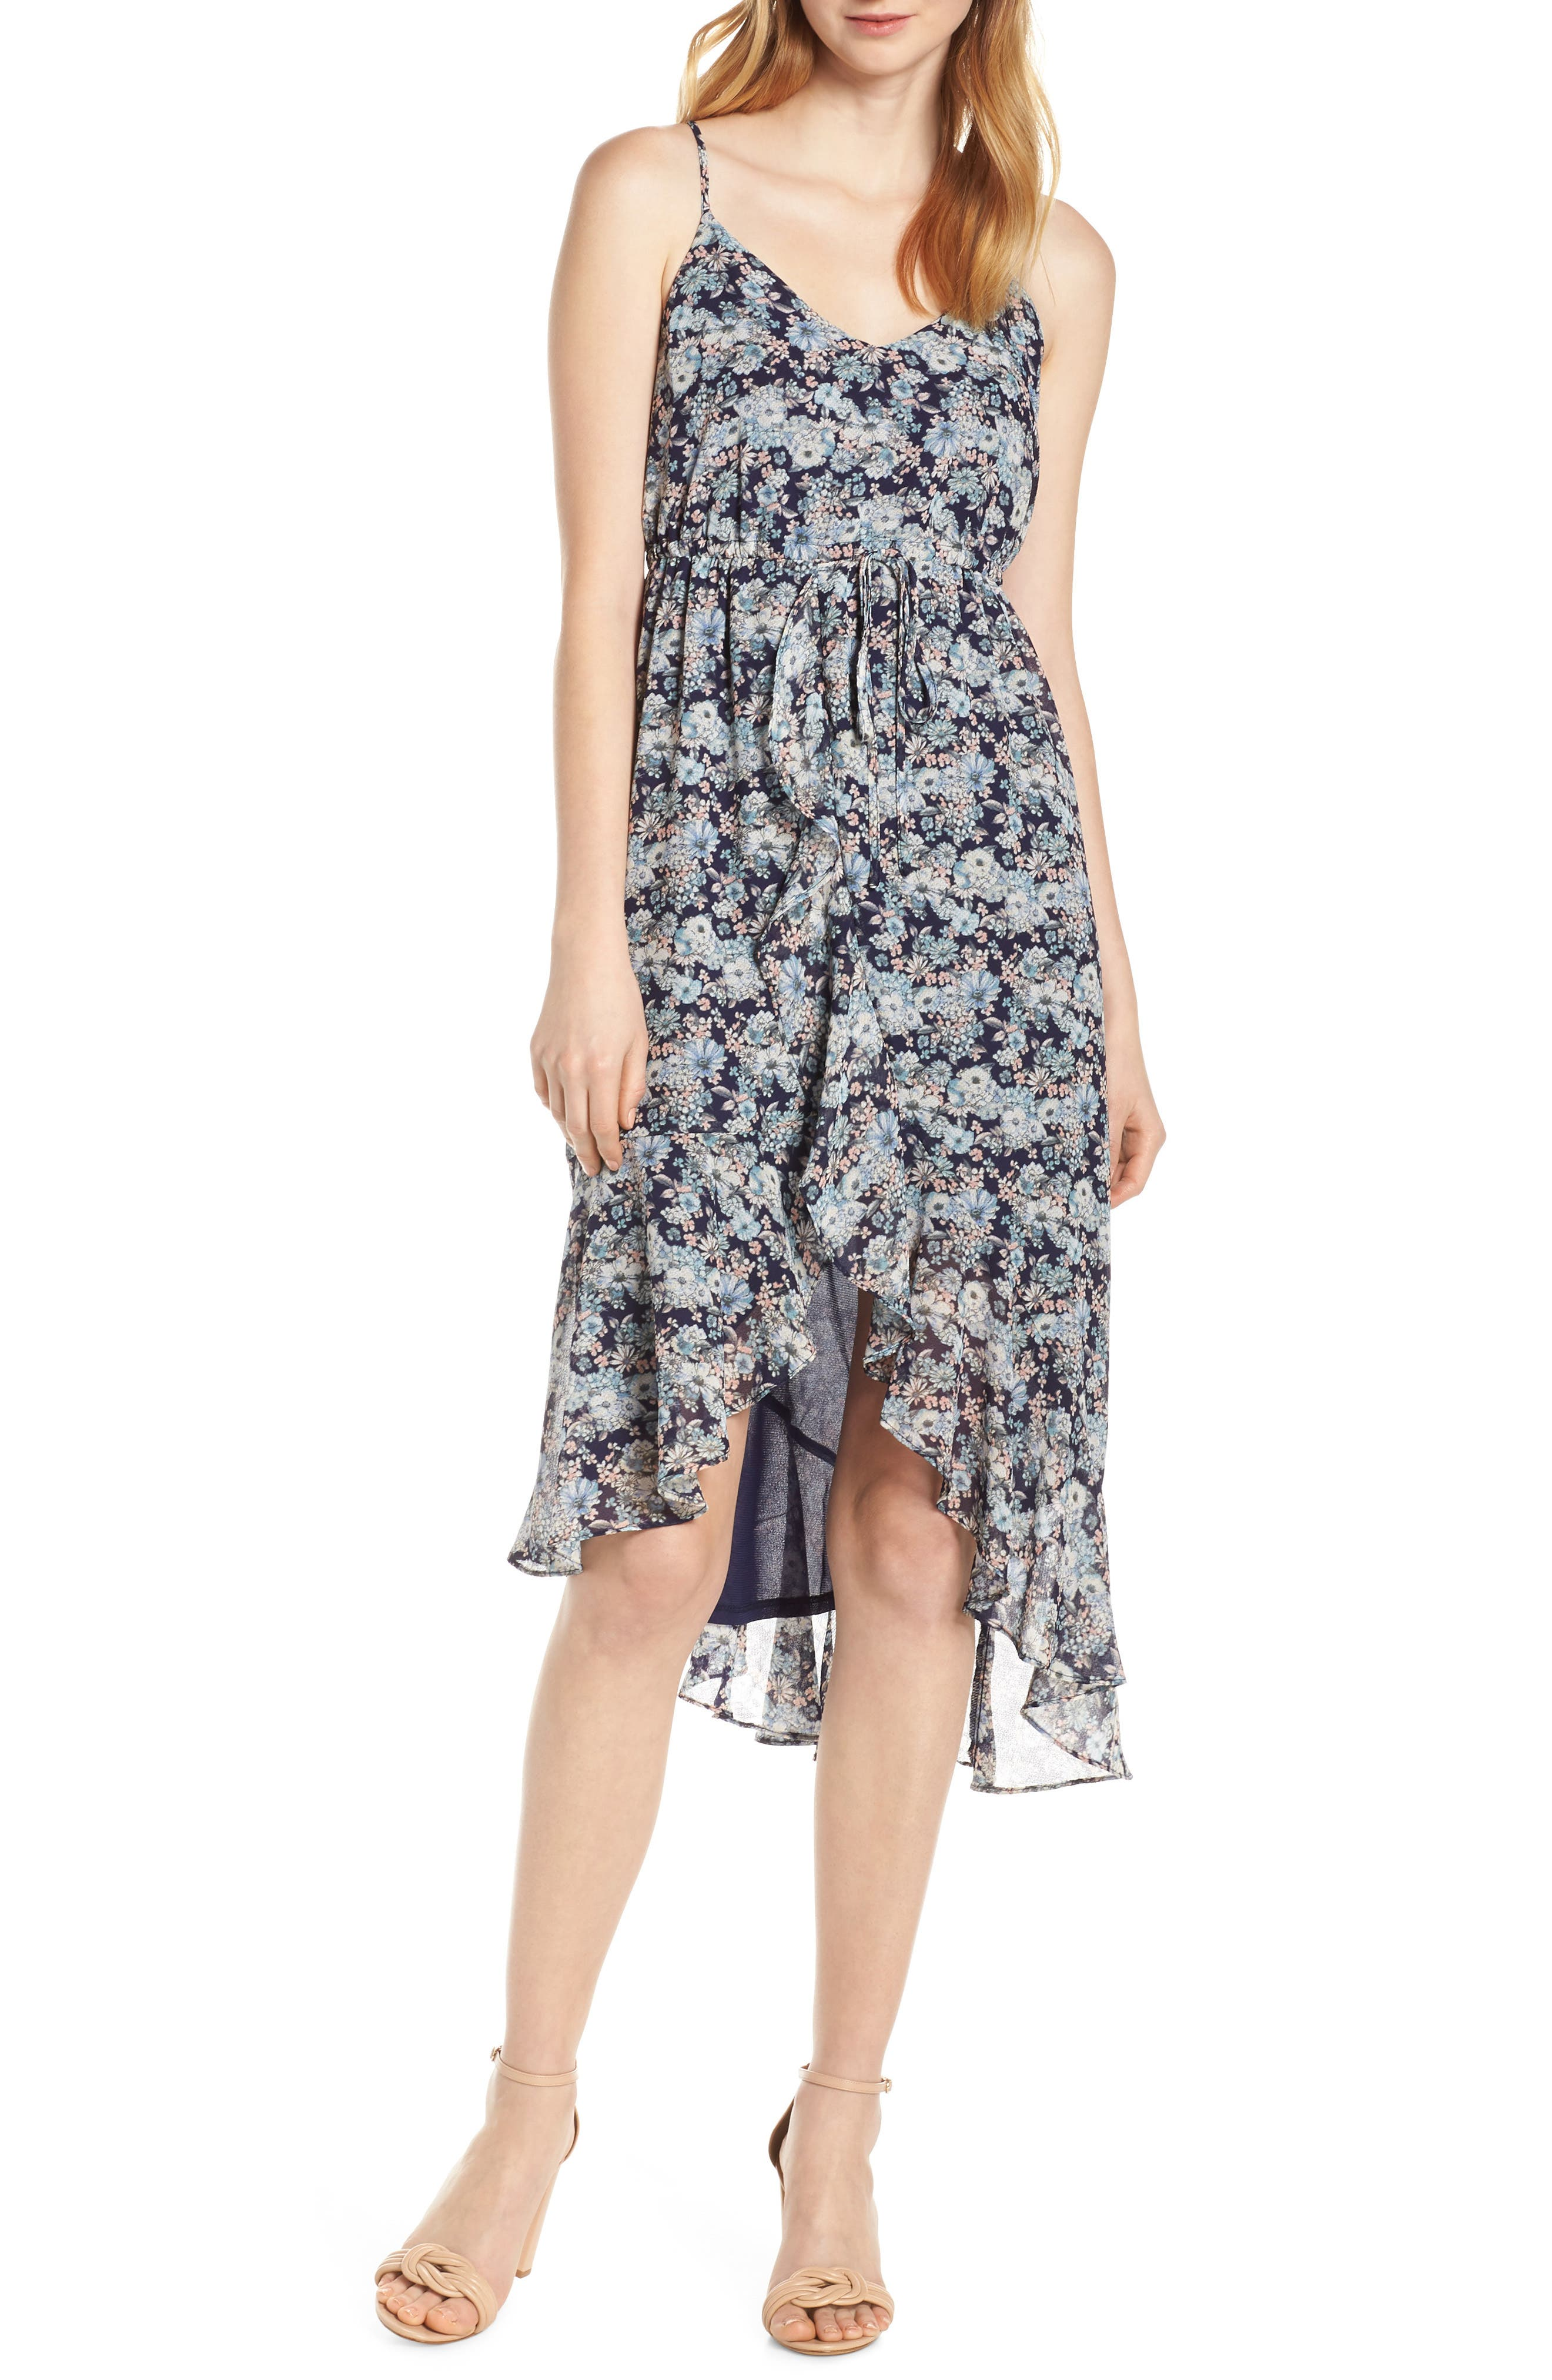 19 COOPER, Asymmetrical Ruffle Hem Dress, Main thumbnail 1, color, 410